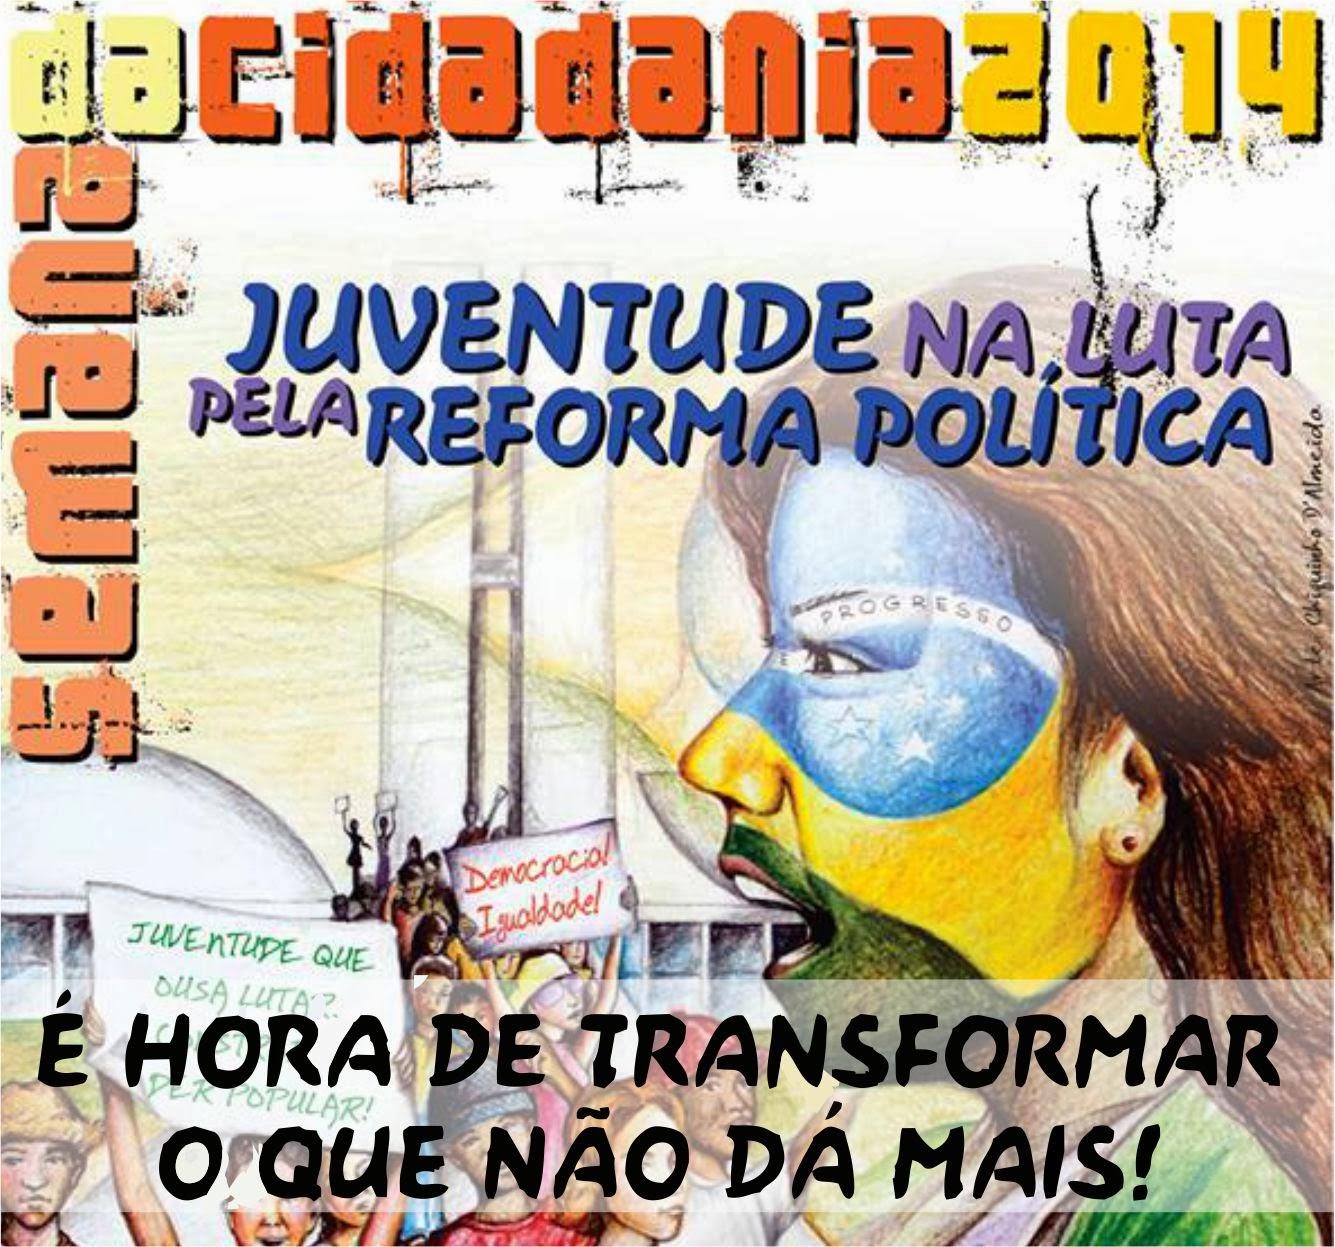 Semanda Cidadania 2014